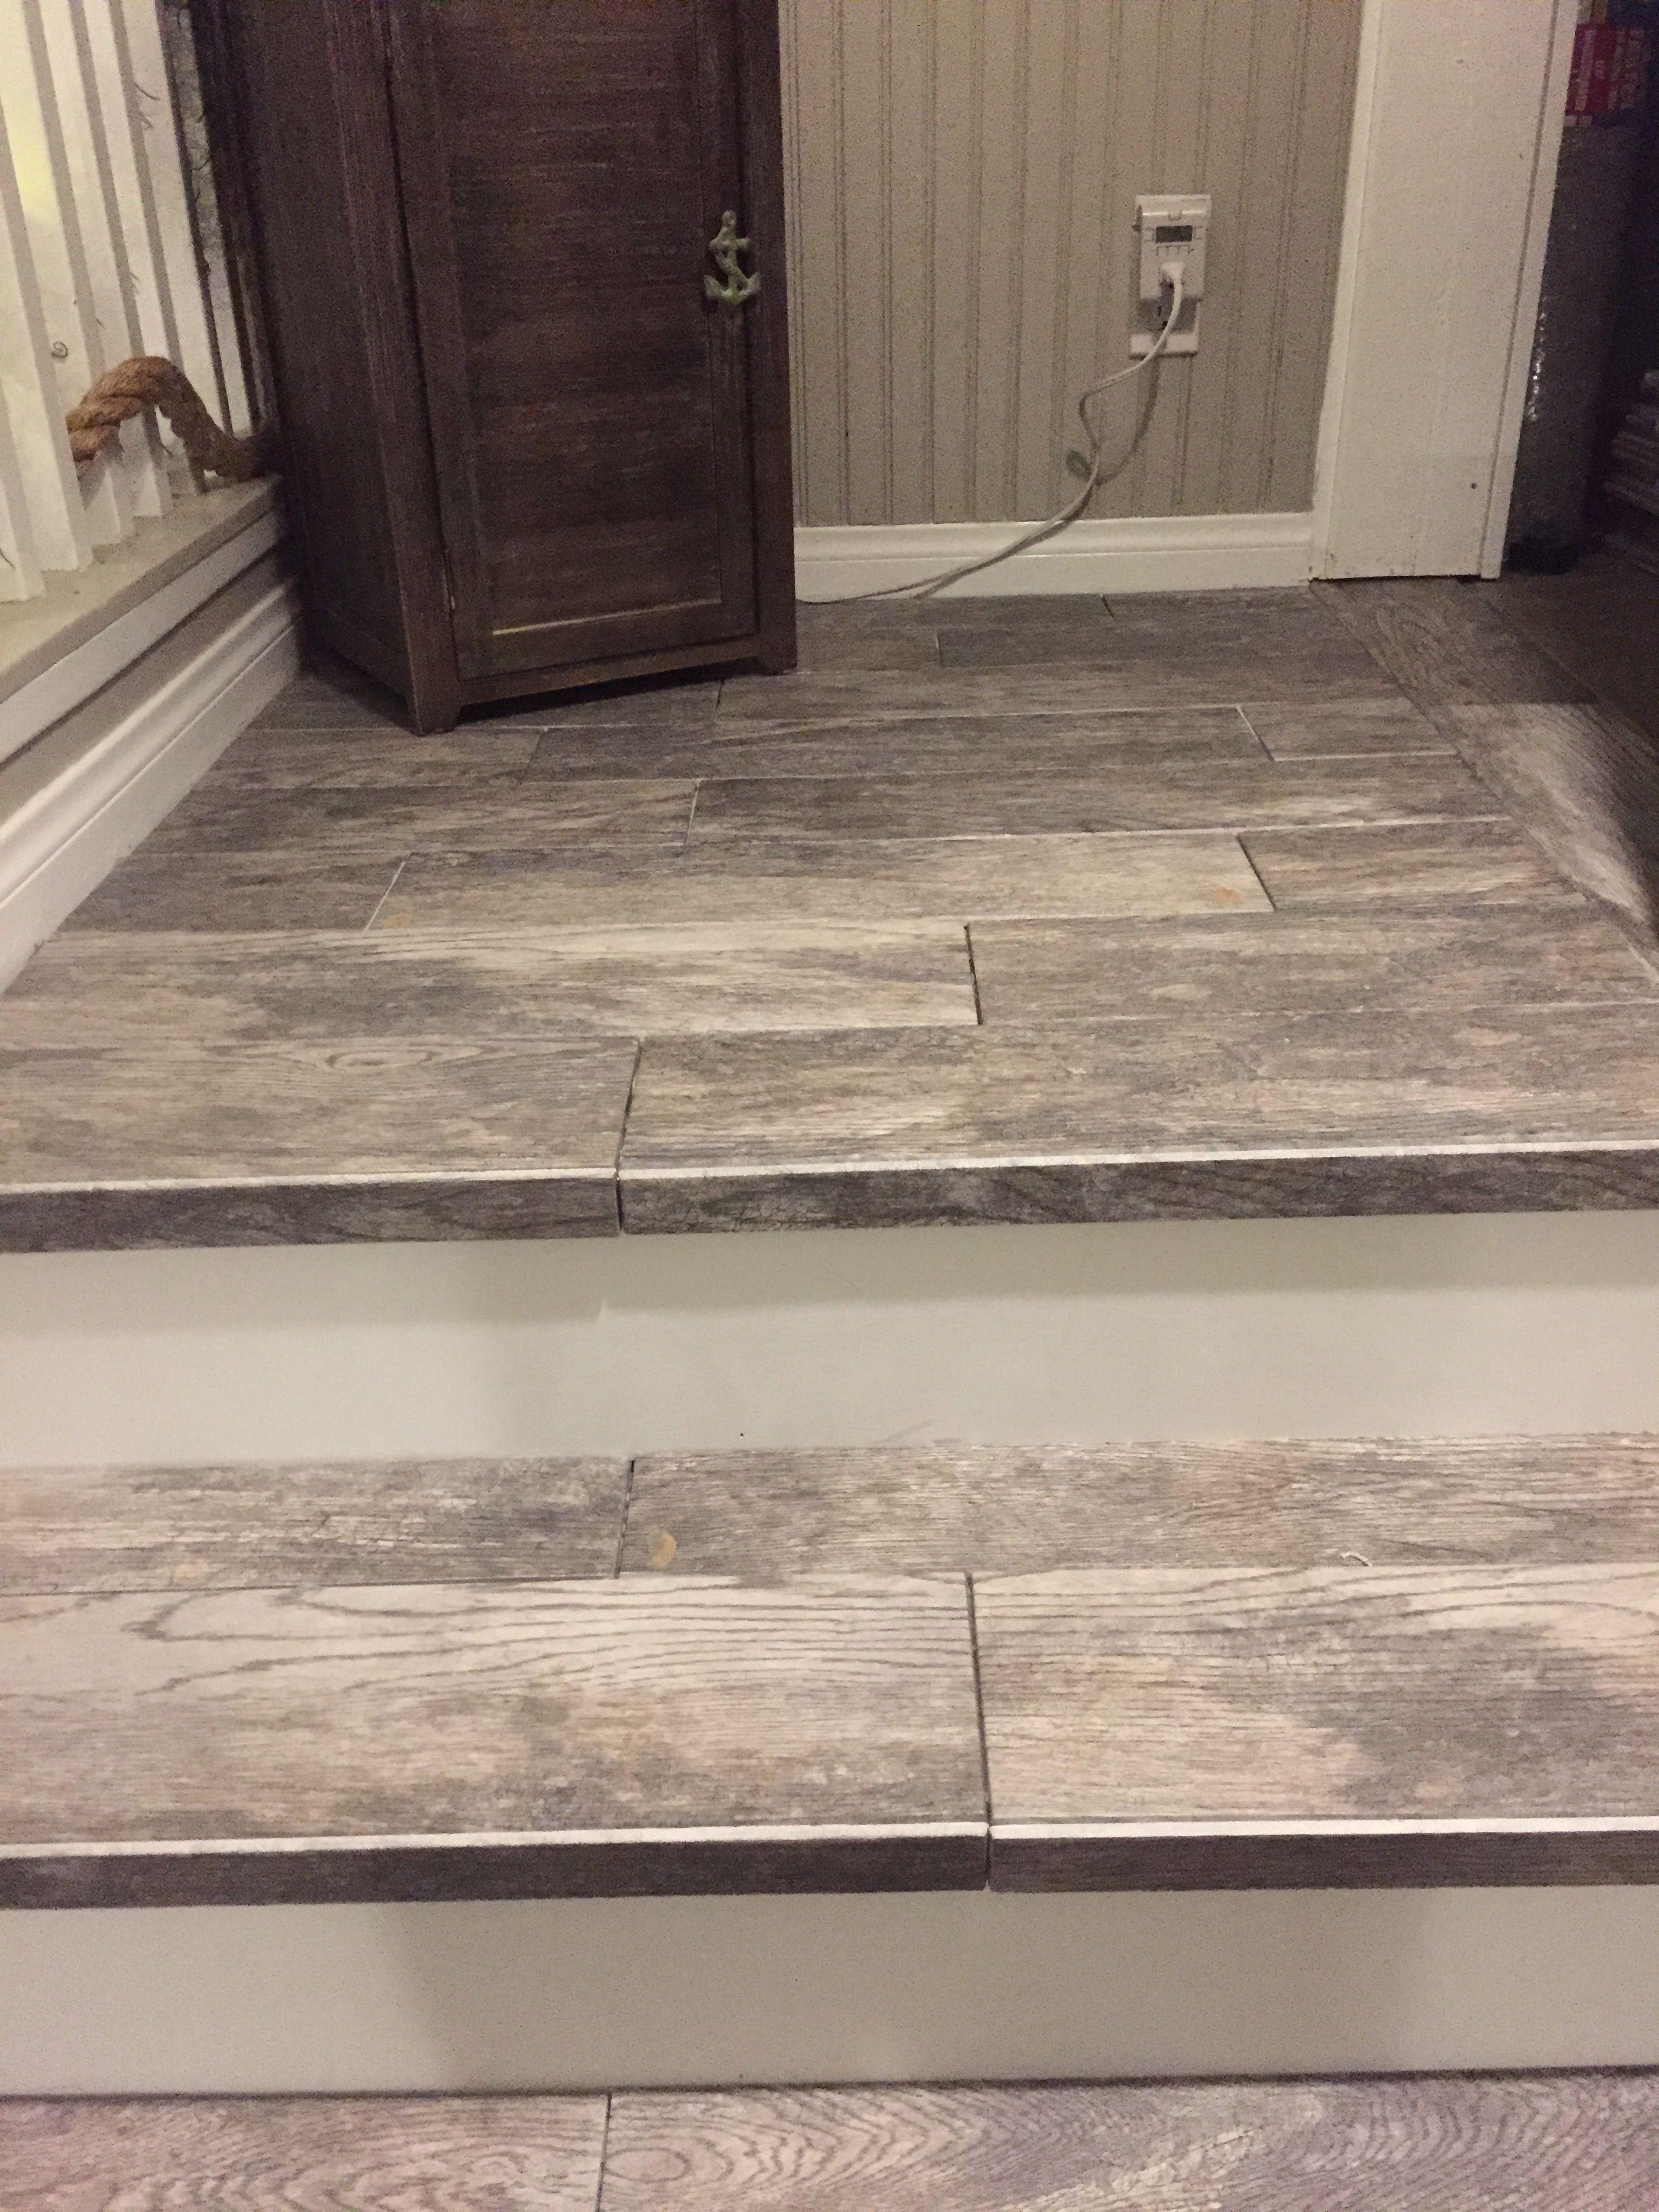 Tiled Stairs Wood Look Barn Wood Stairs Wood Tile Tile Stairs | Wood Look Tile For Stairs | Weathered Wood Distressed | Ceramic | Bedroom | Rocell Living Room | Porcelain